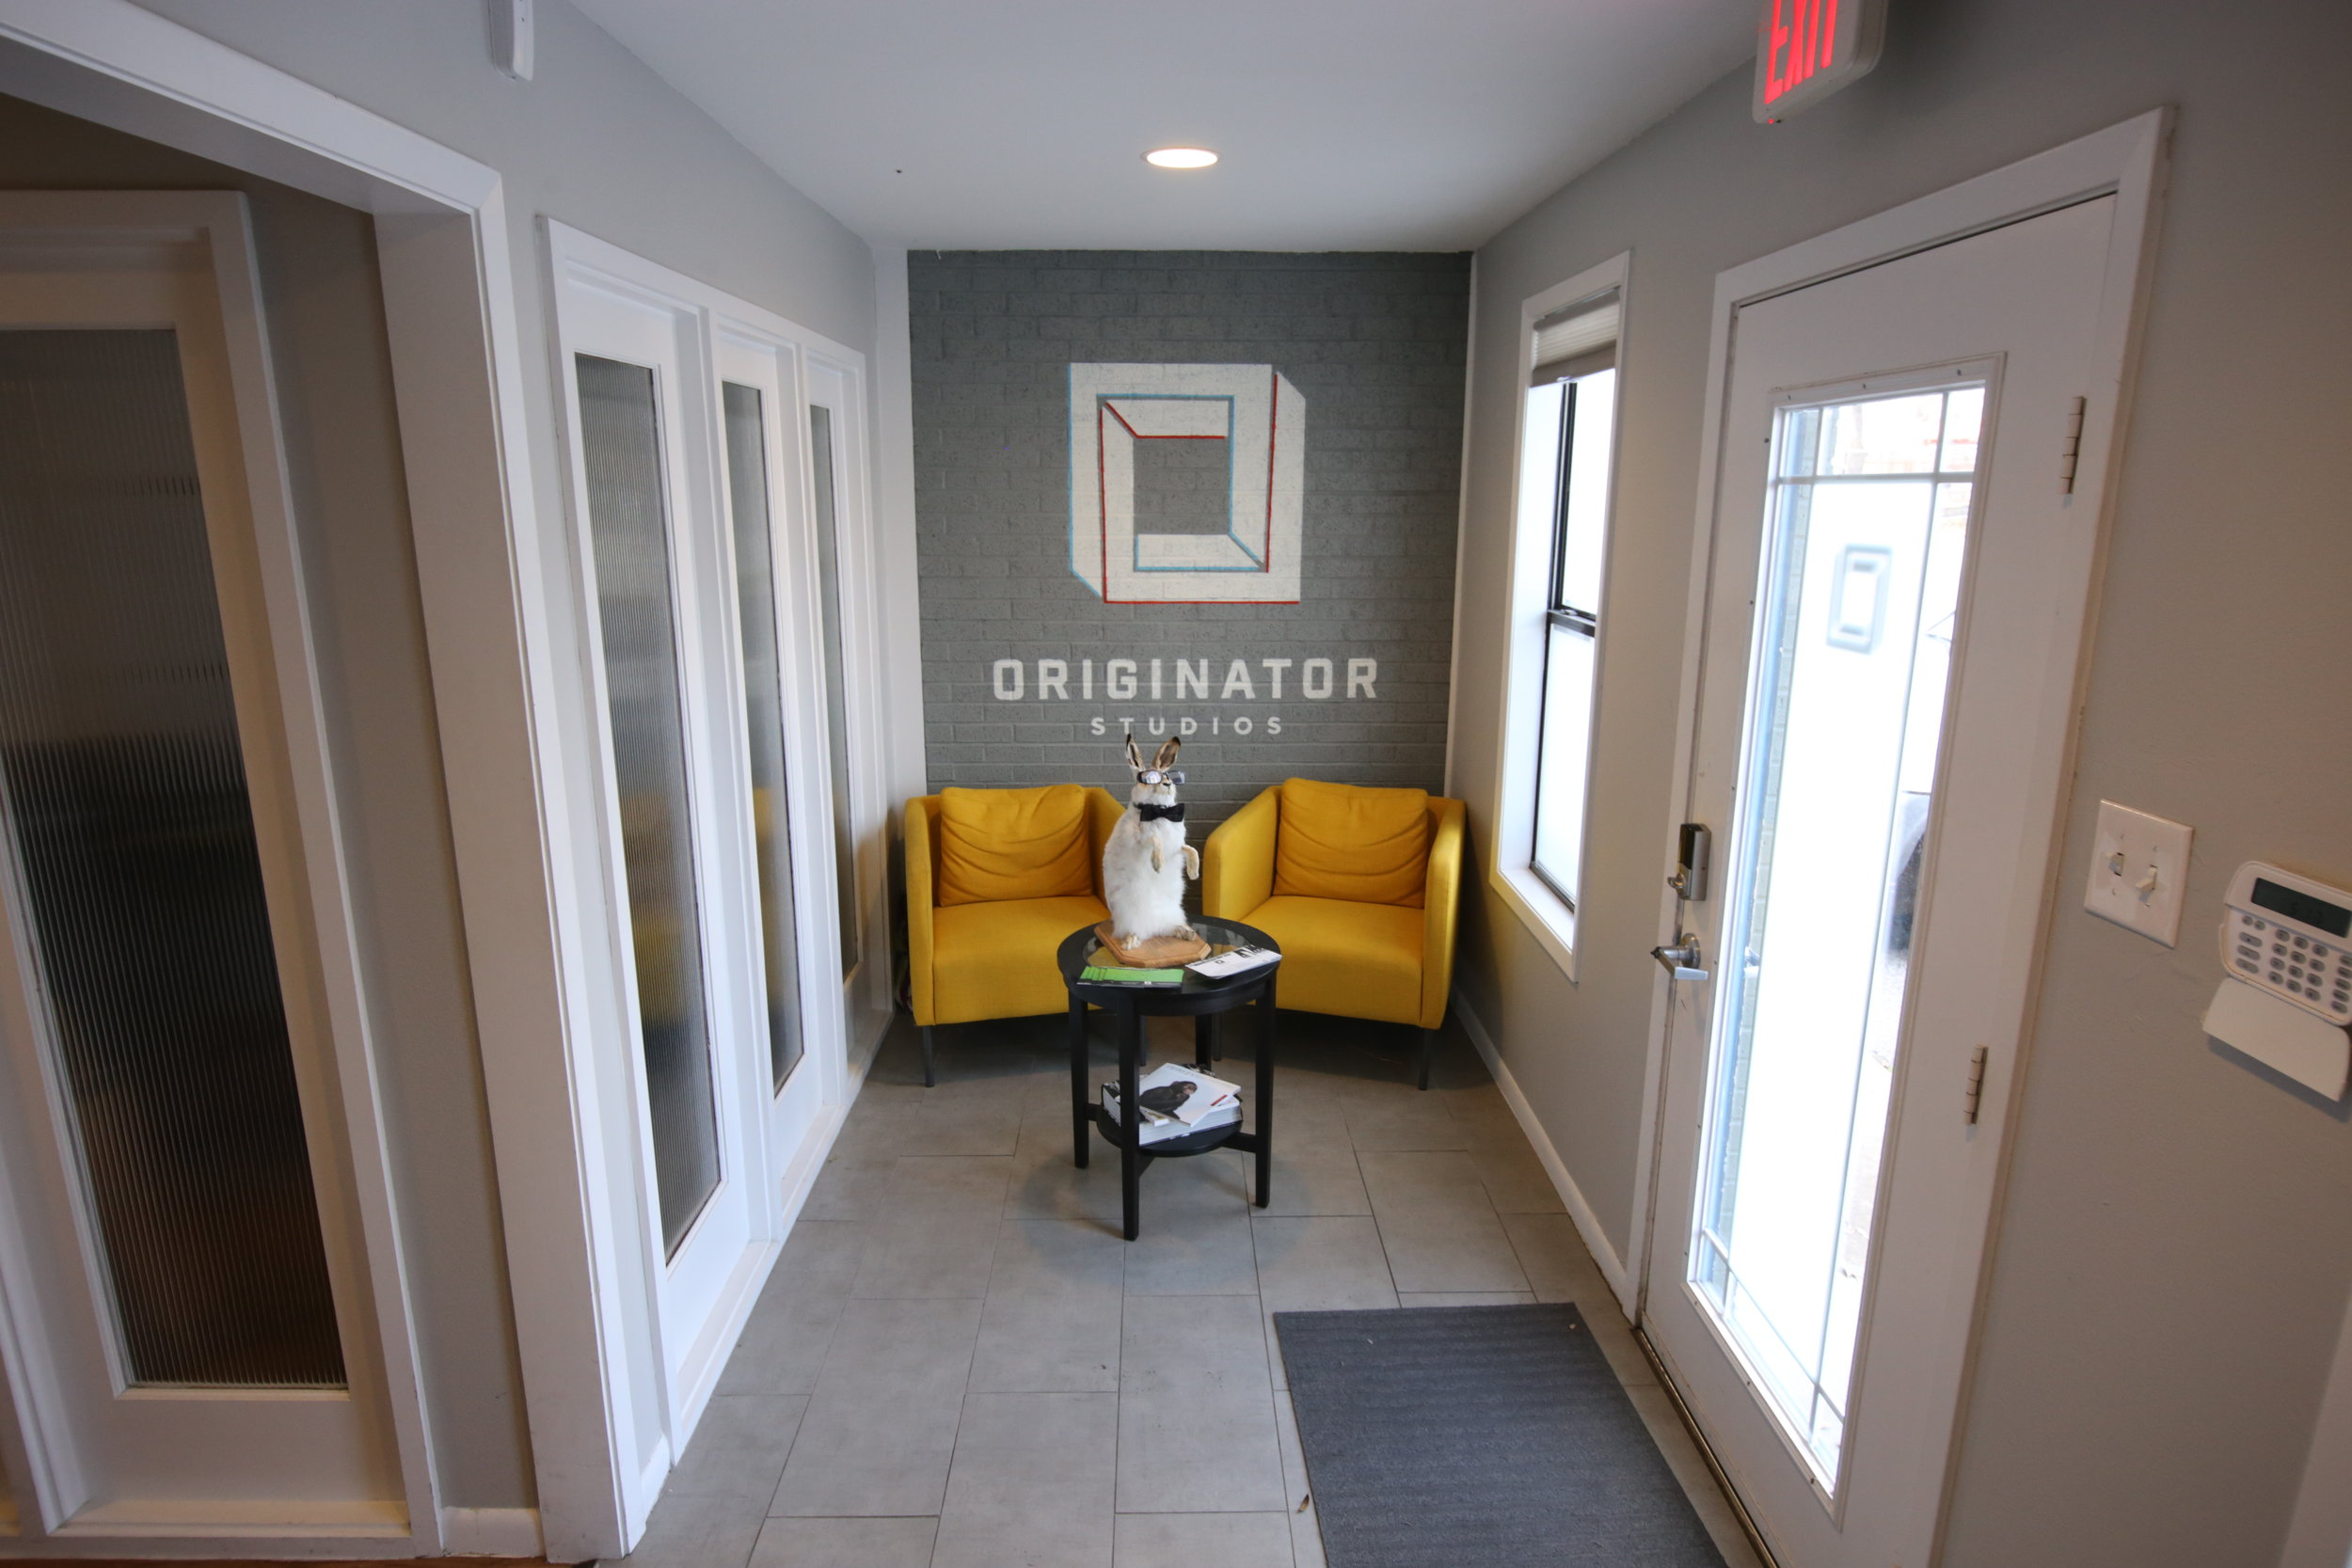 The main lobby of Originator Studios is where studio mascot Mr. Muffin resides.